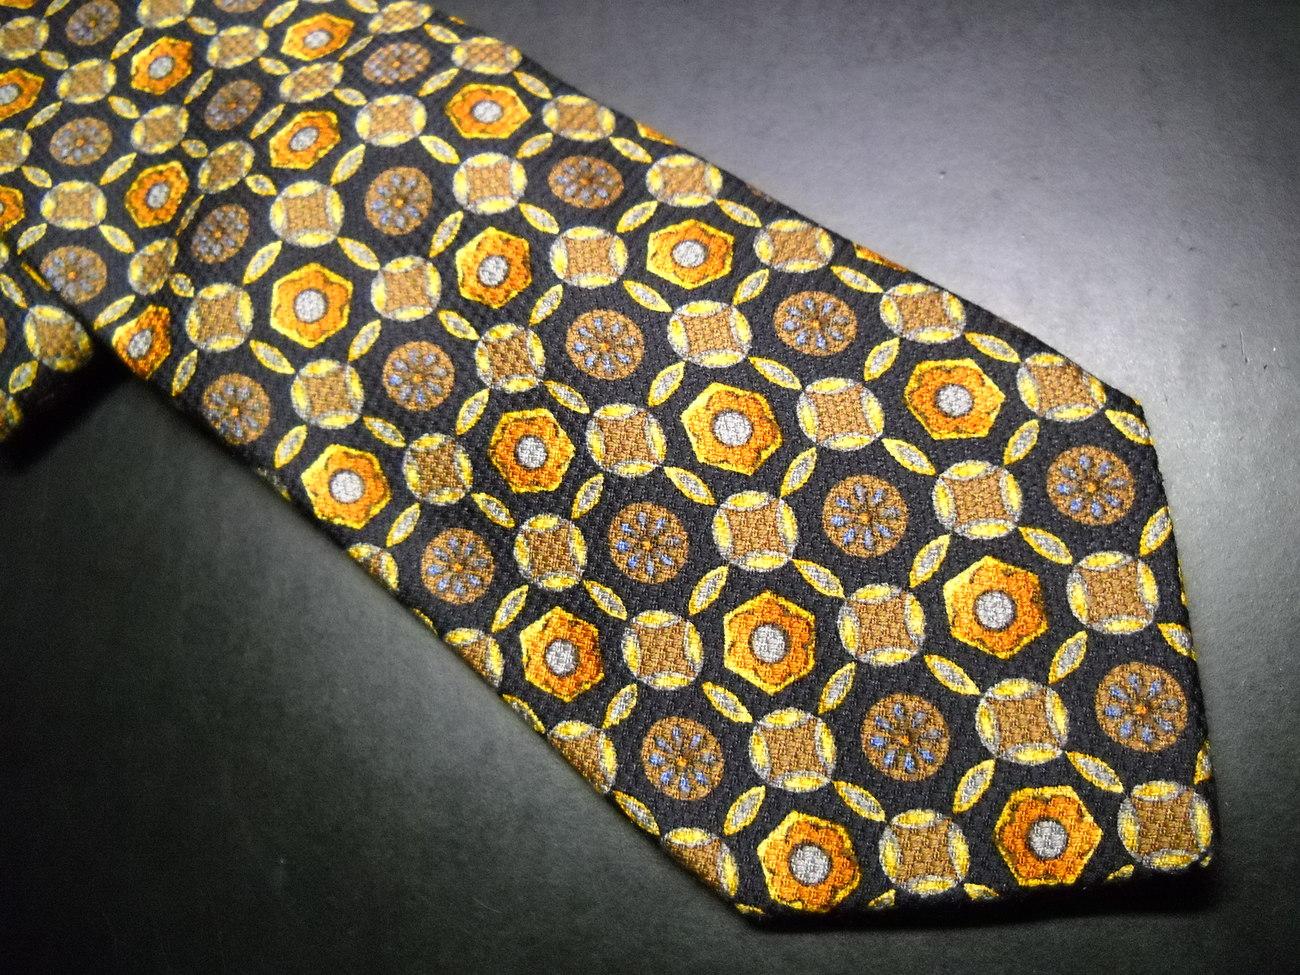 Ermenegildo Zegna Disegno Neck Tie Black Browns Made in Italy